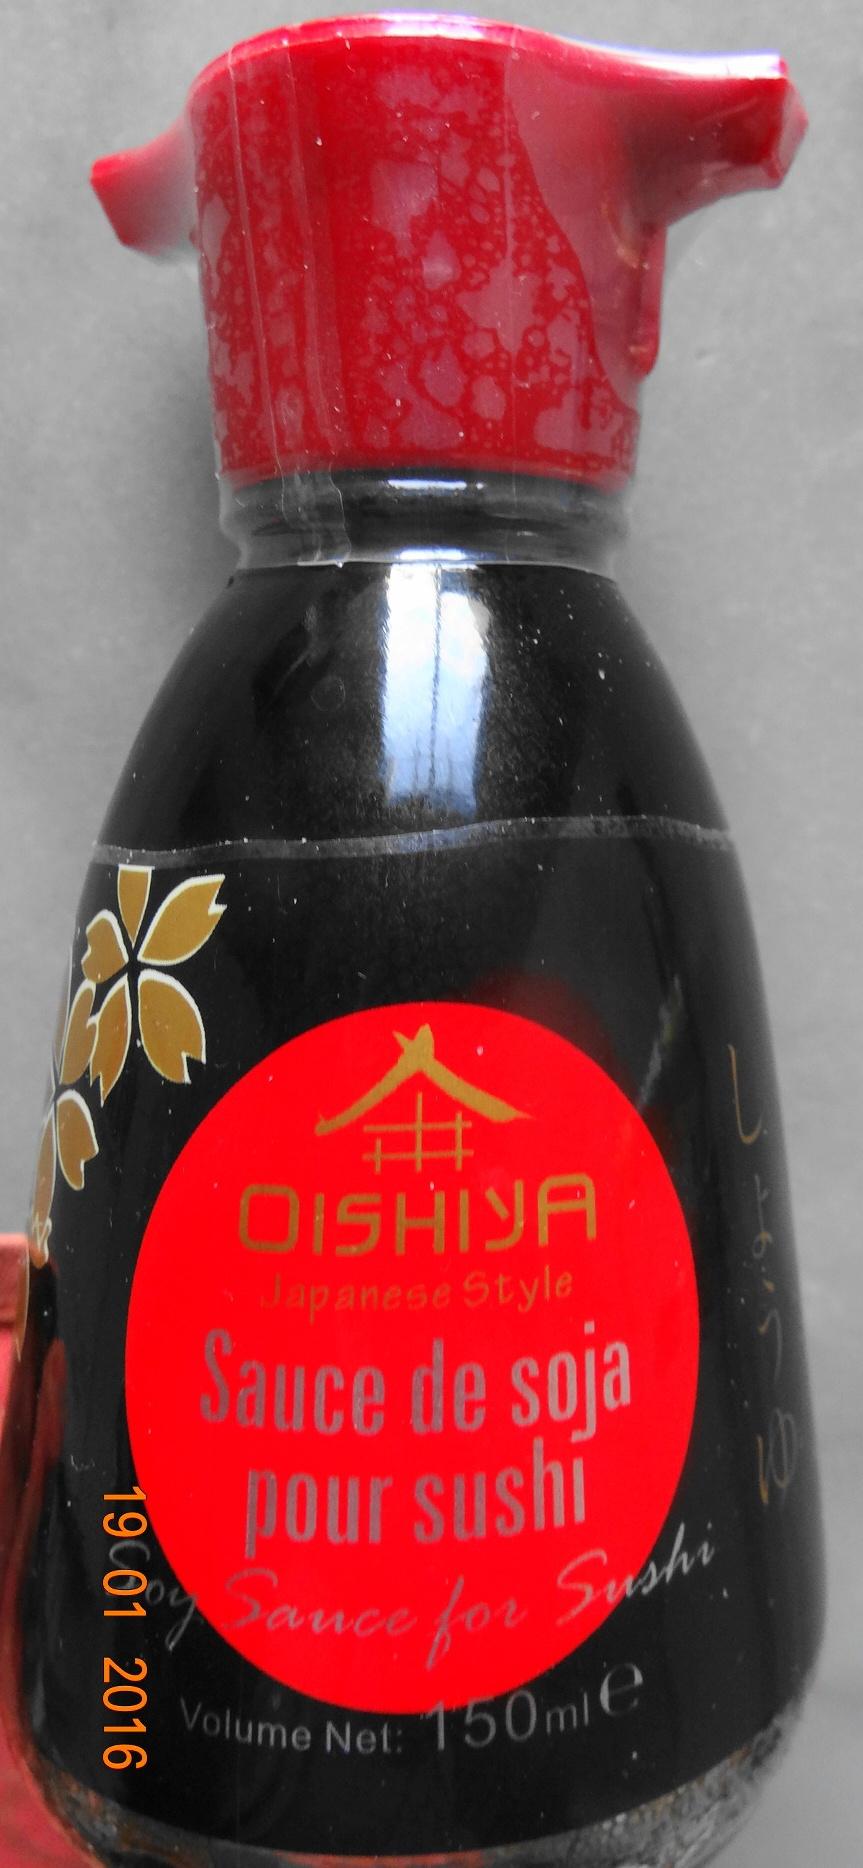 Sauce de Soja pour sushi, Oishiya - Product - fr